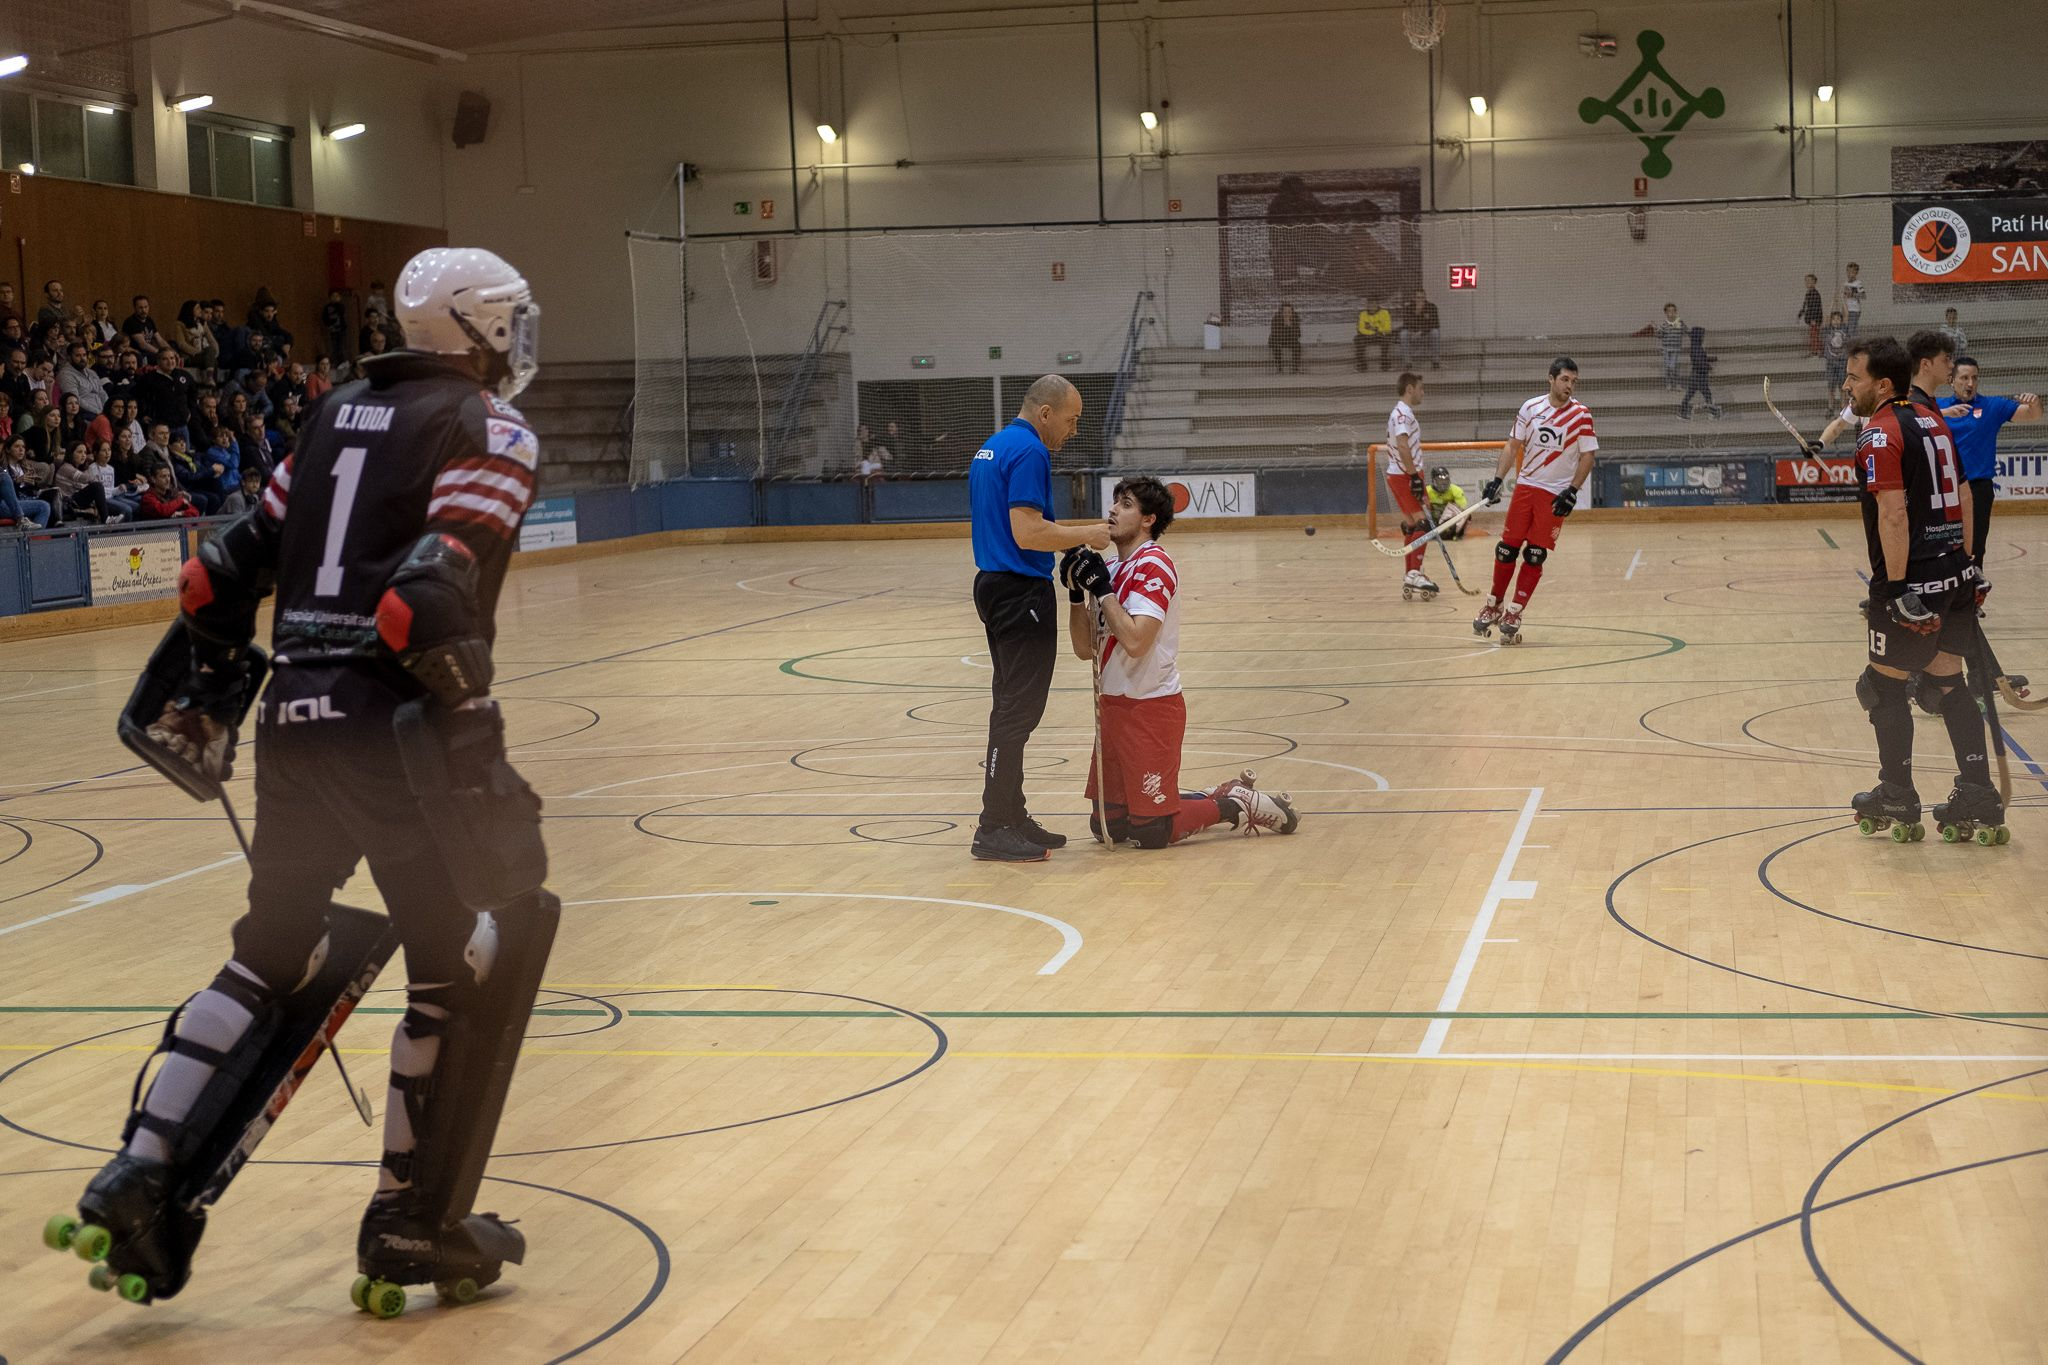 Partit de lliga, hockey sobre patins masculí: PHC Sant Cugat-CP Vic. FOTO: Ale Gómez